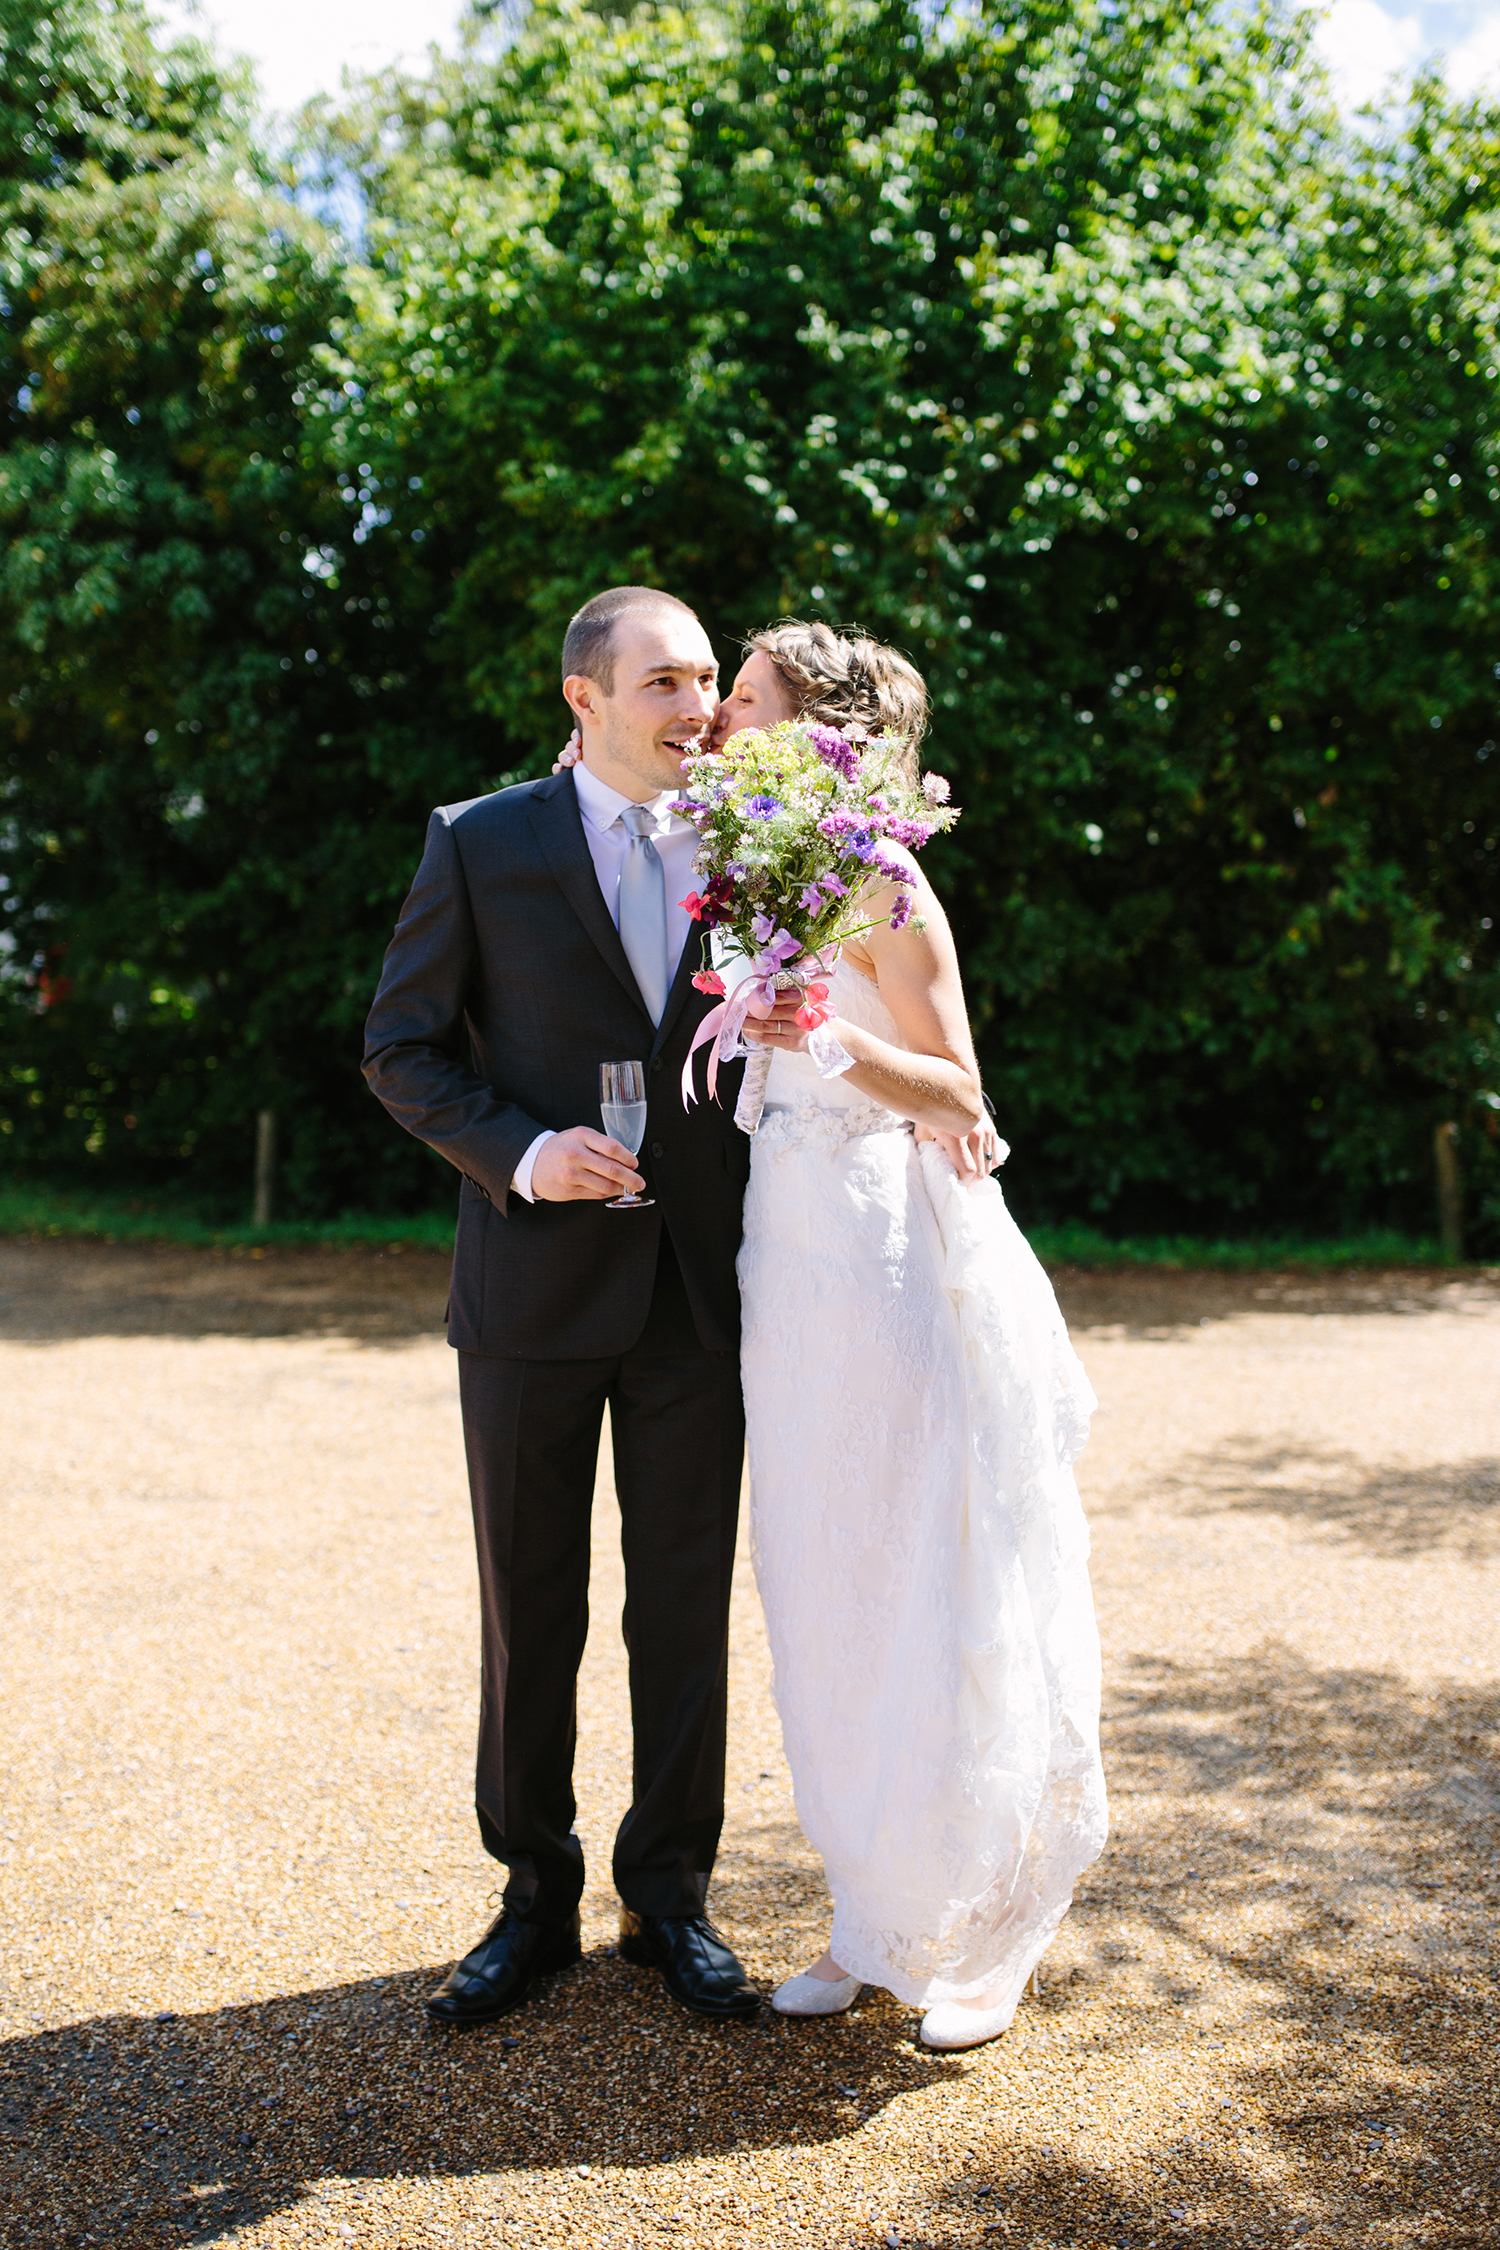 wedding-photographer-worcester-019.jpg